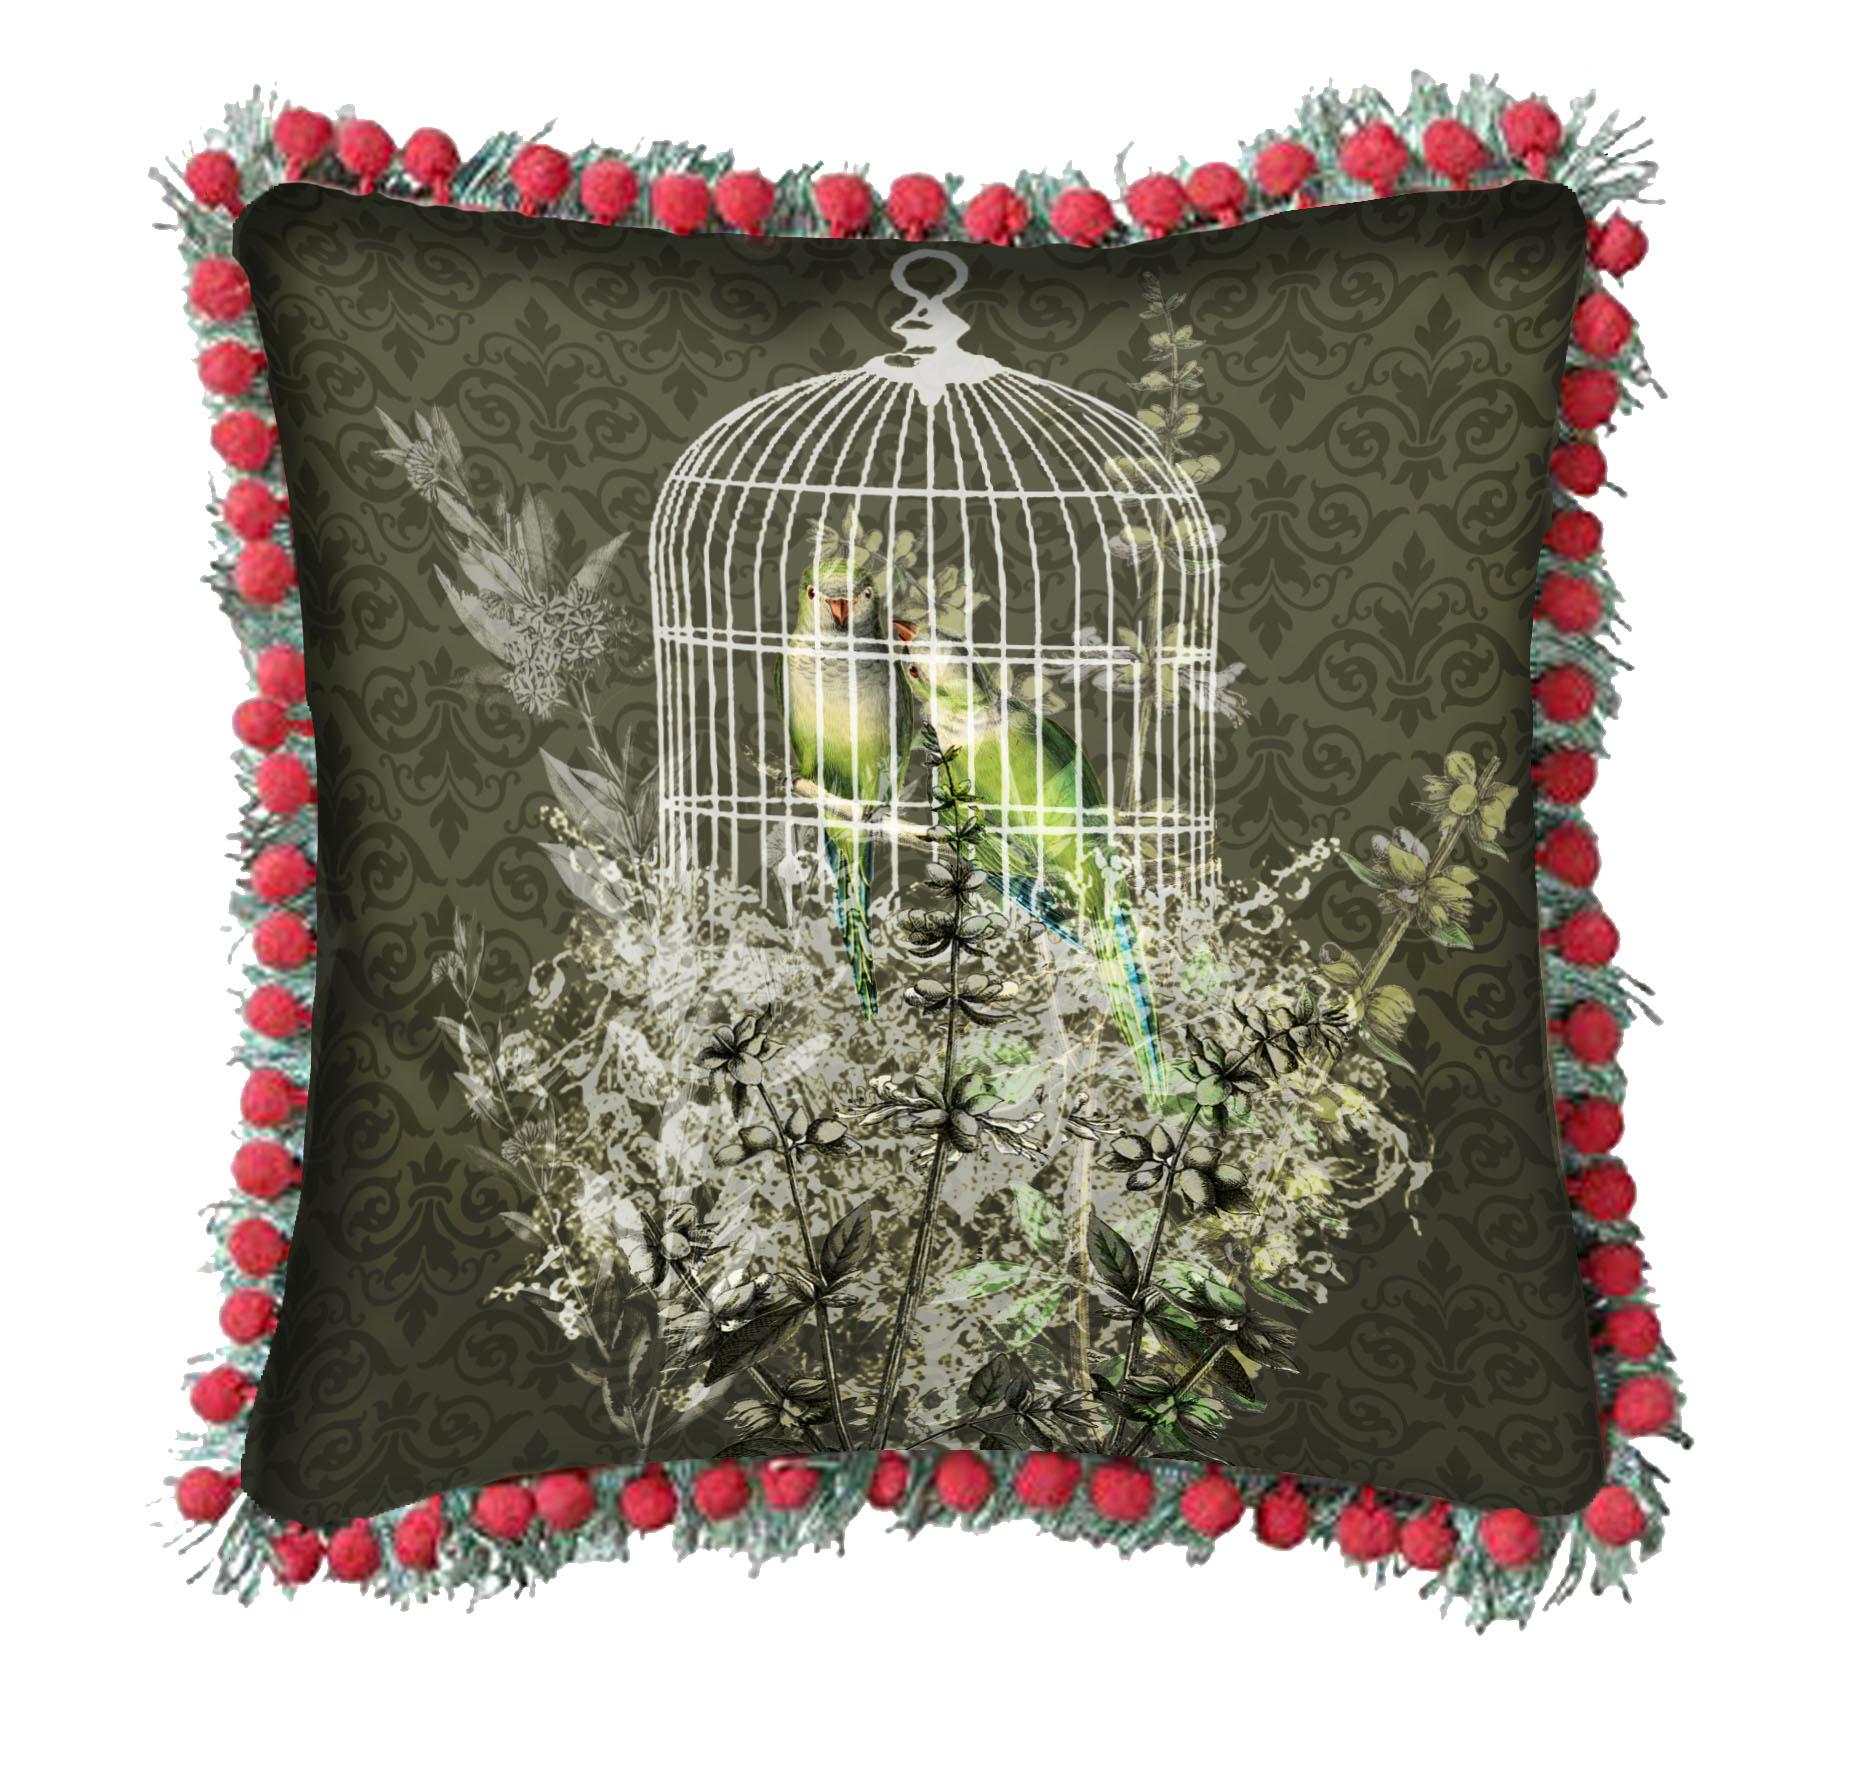 birdcage wflowers pilow comp